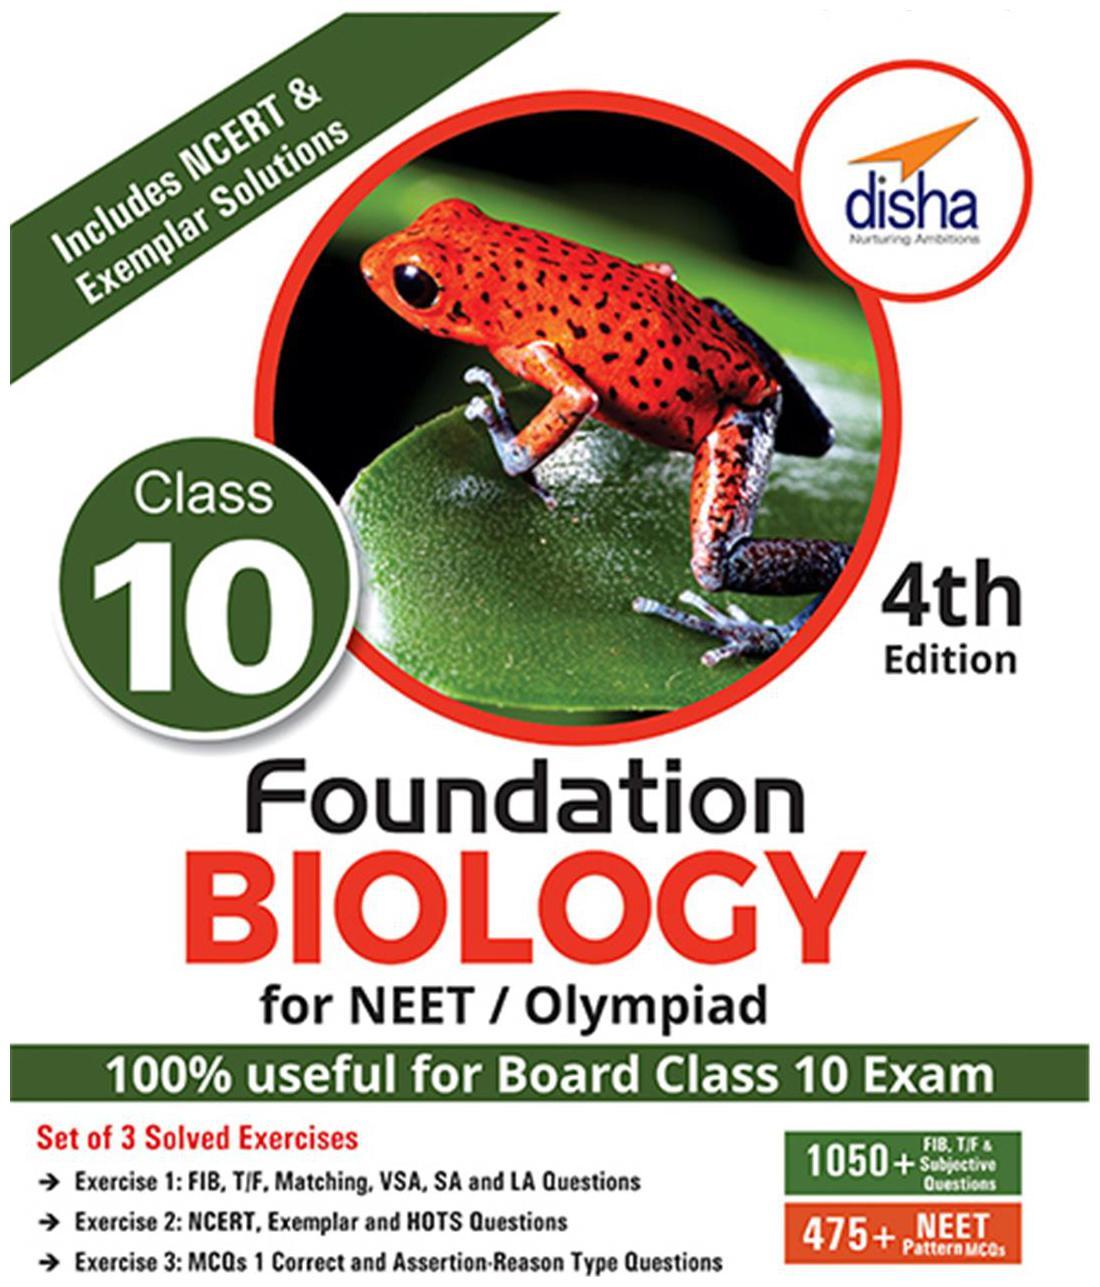 Foundation Biology For NEET/ Olympiad Class 10